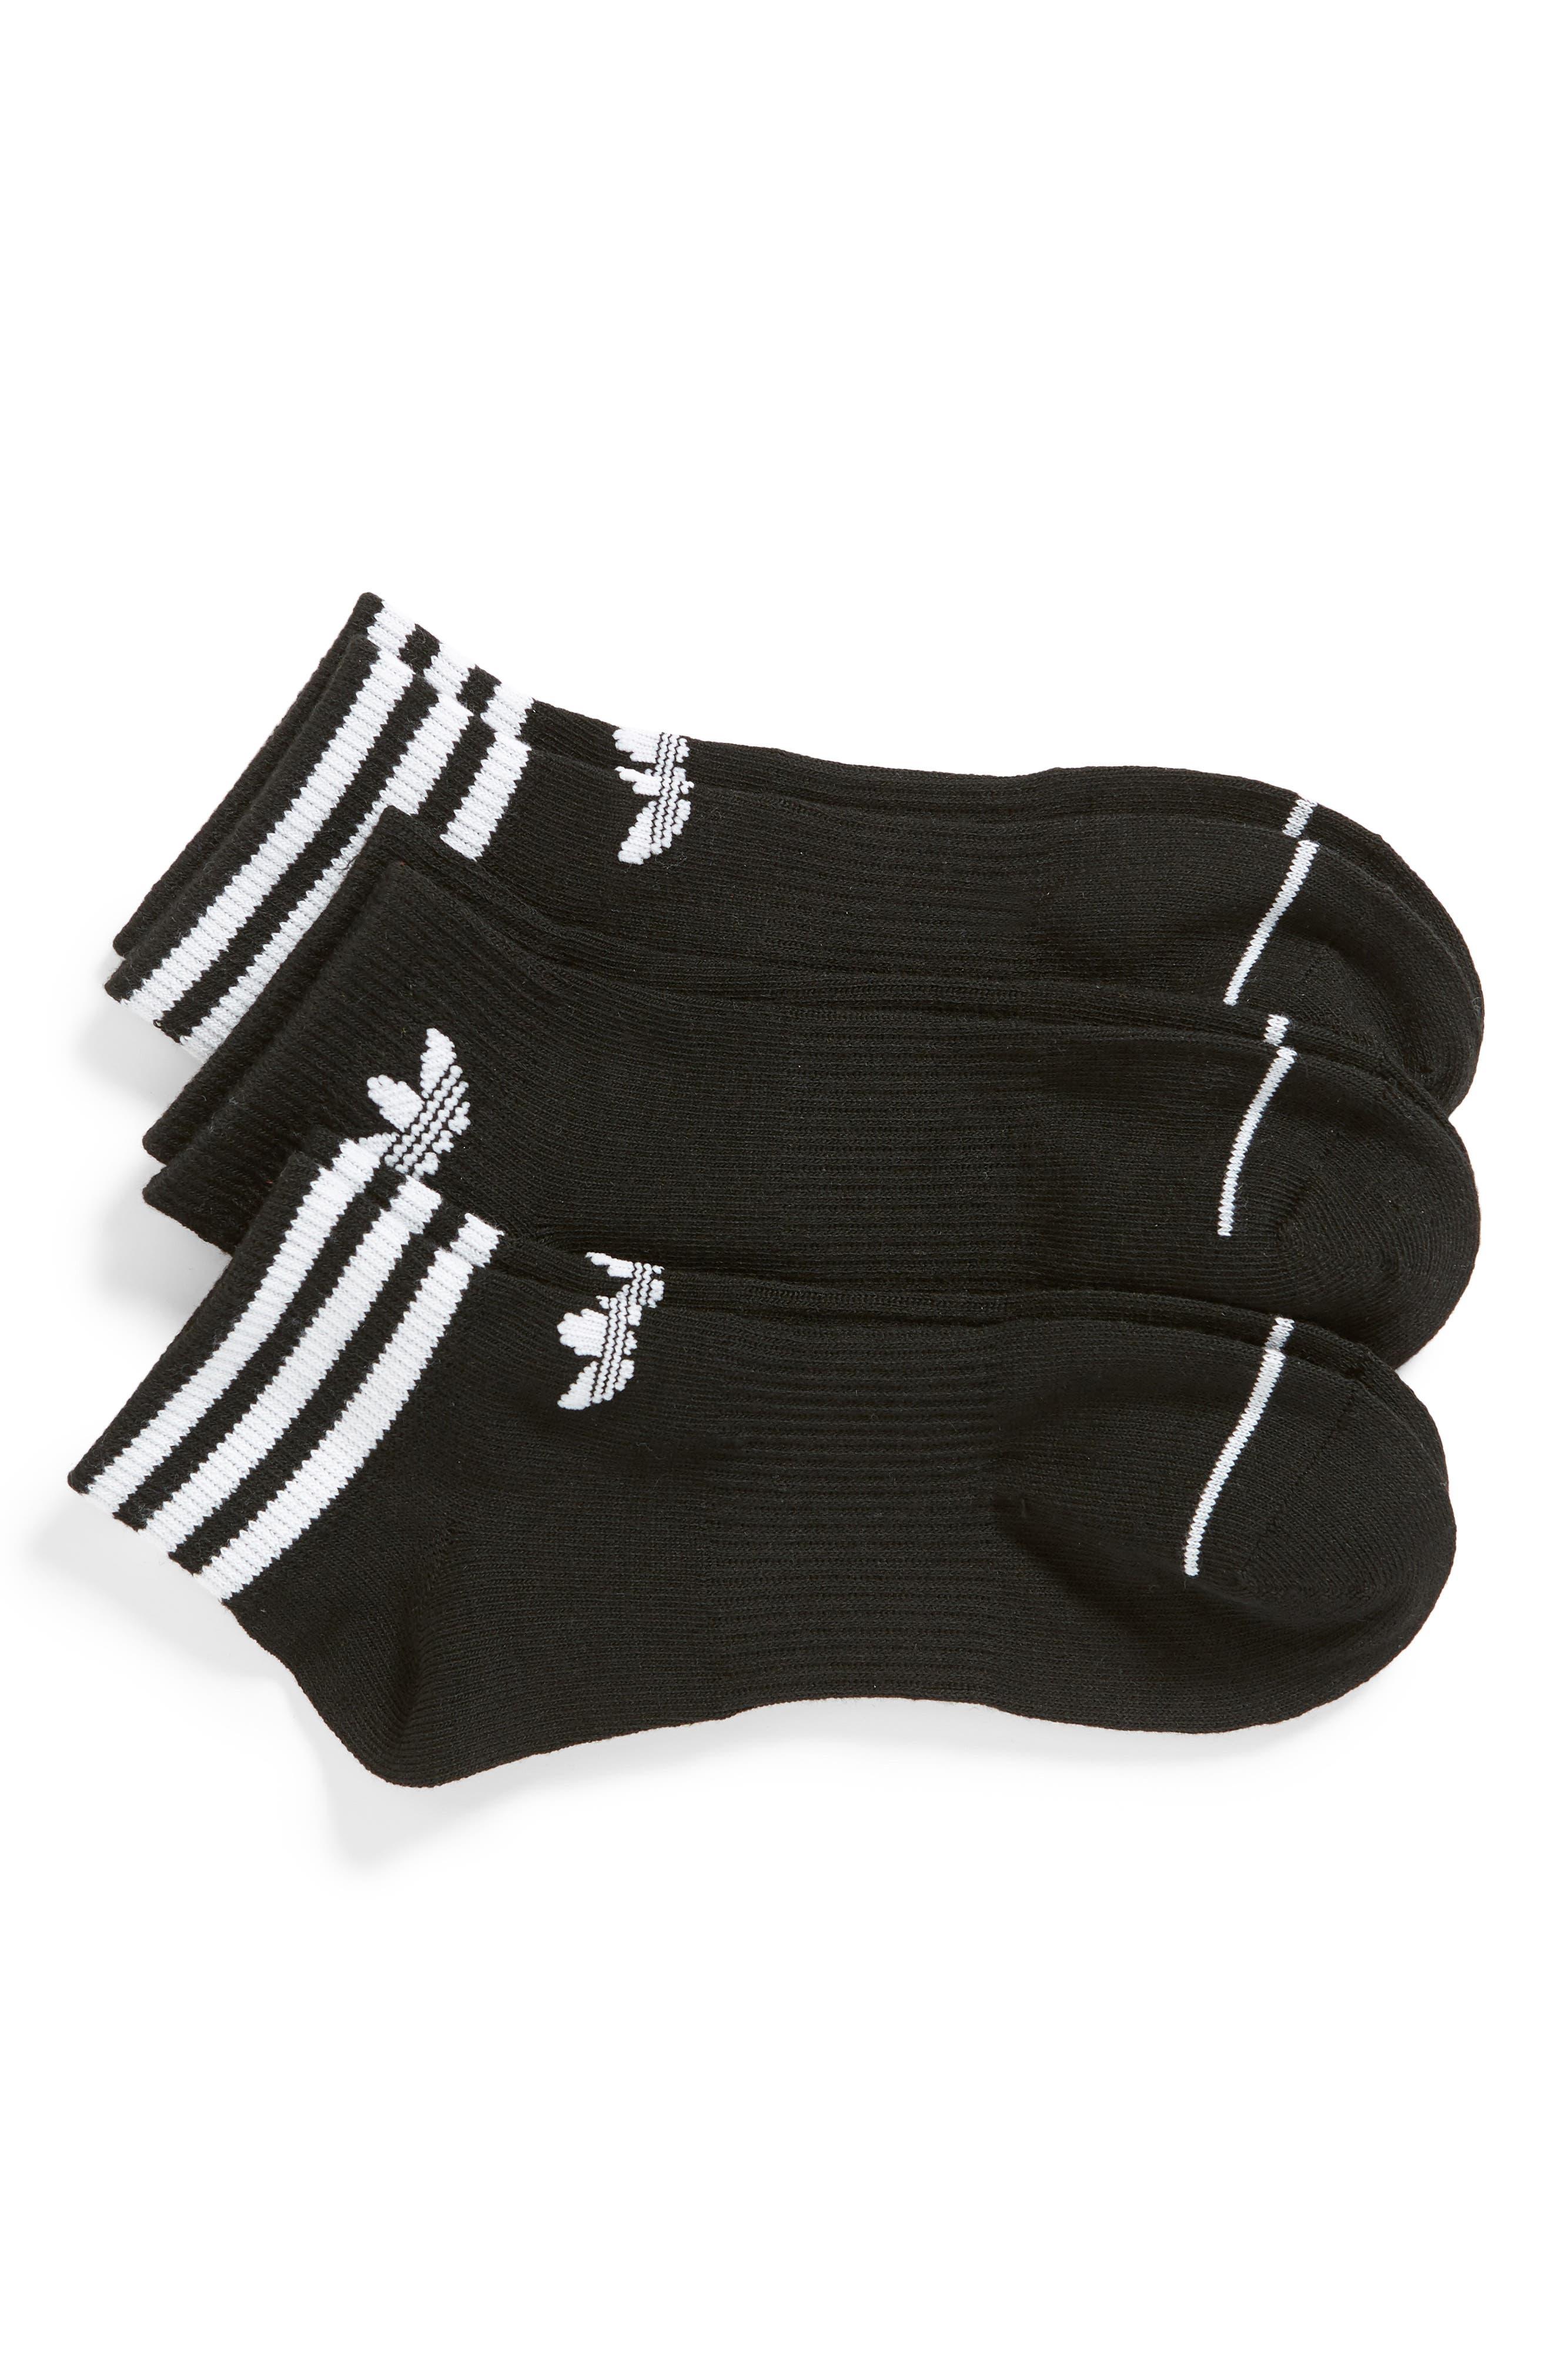 Originals 3-Pack Ankle Socks,                             Main thumbnail 1, color,                             BLACK